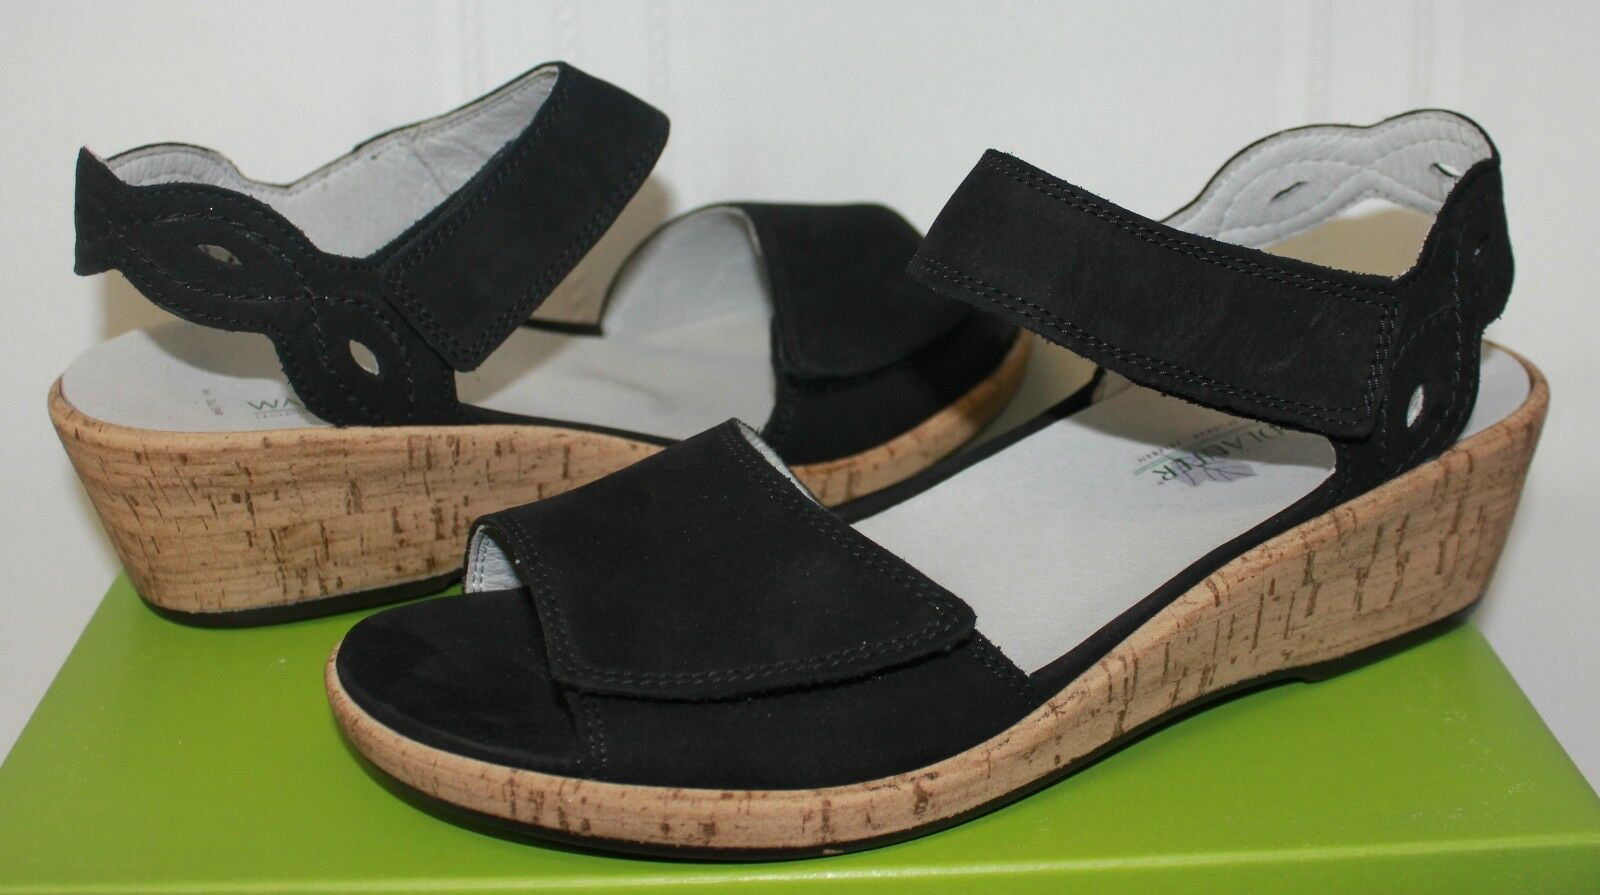 Waldlaufer Mira Helinda nero Nubuck Nubuck Nubuck Leather Wedge Sandals scarpe New 9356e9